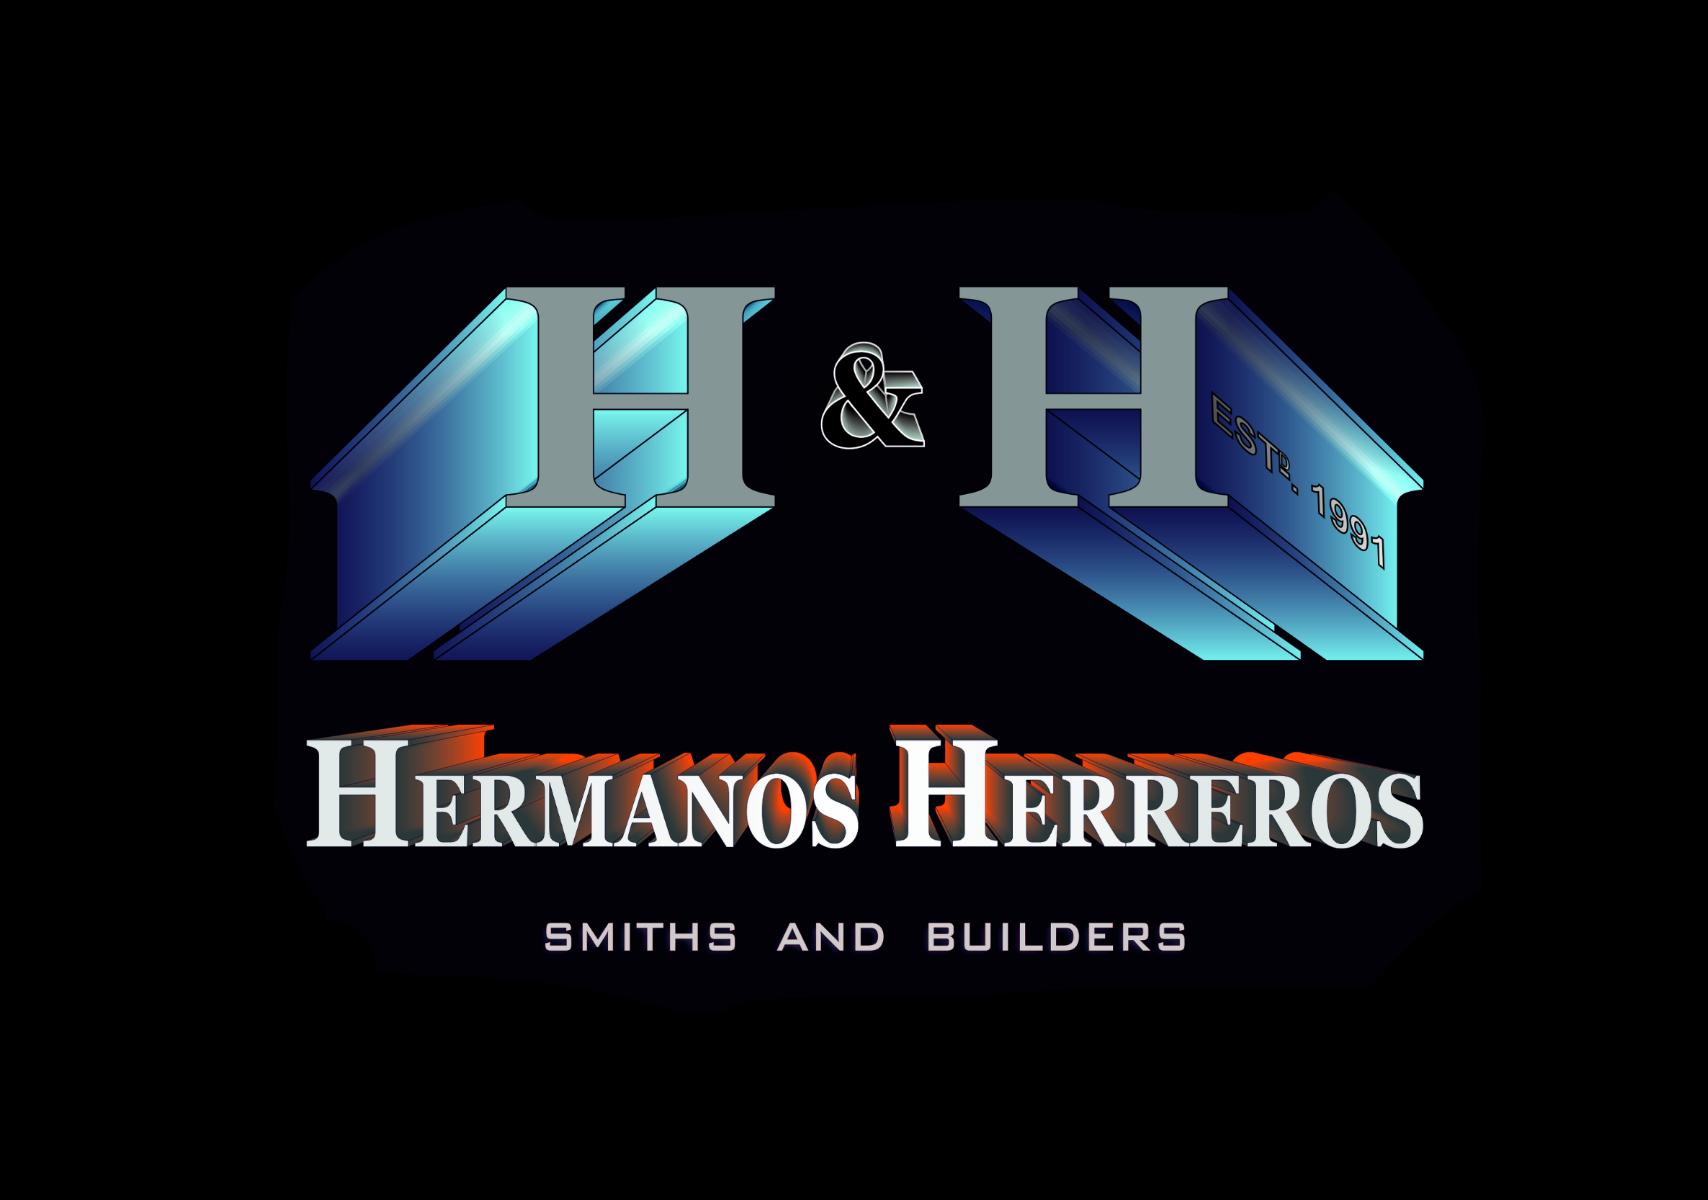 HERMANOS HERREROS